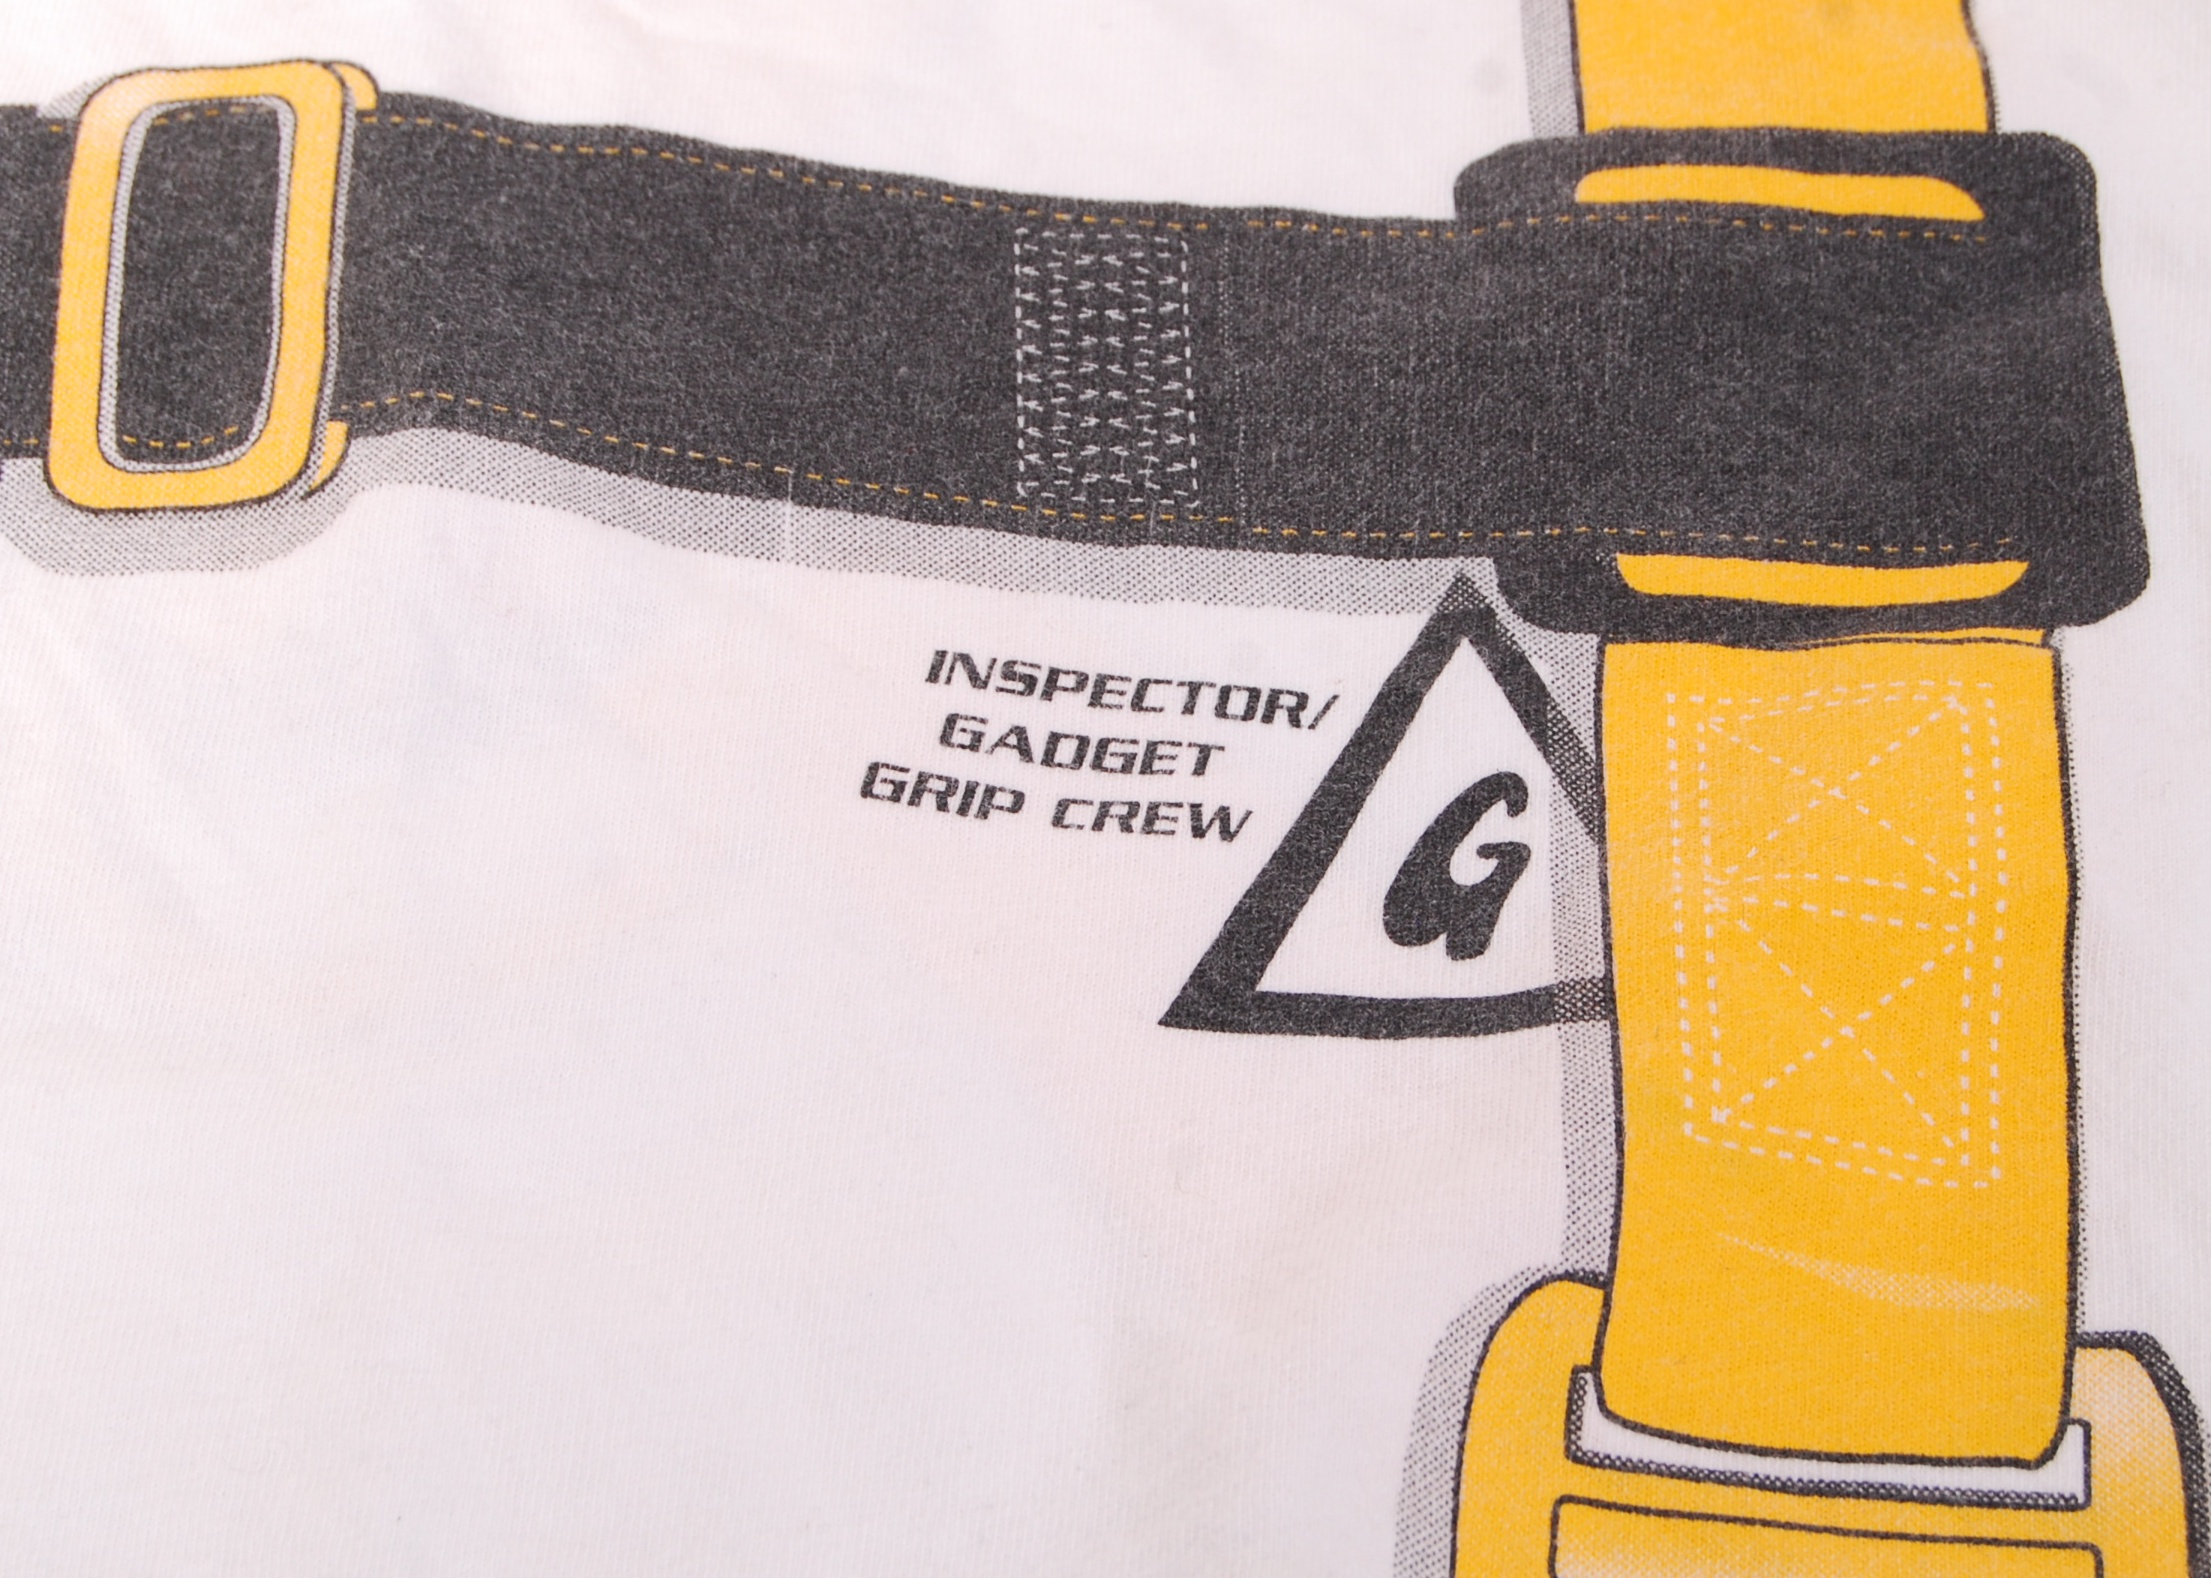 INSPECTOR GADGET - ORIGINAL CREW ISSUED T-SHIRT - Image 2 of 3